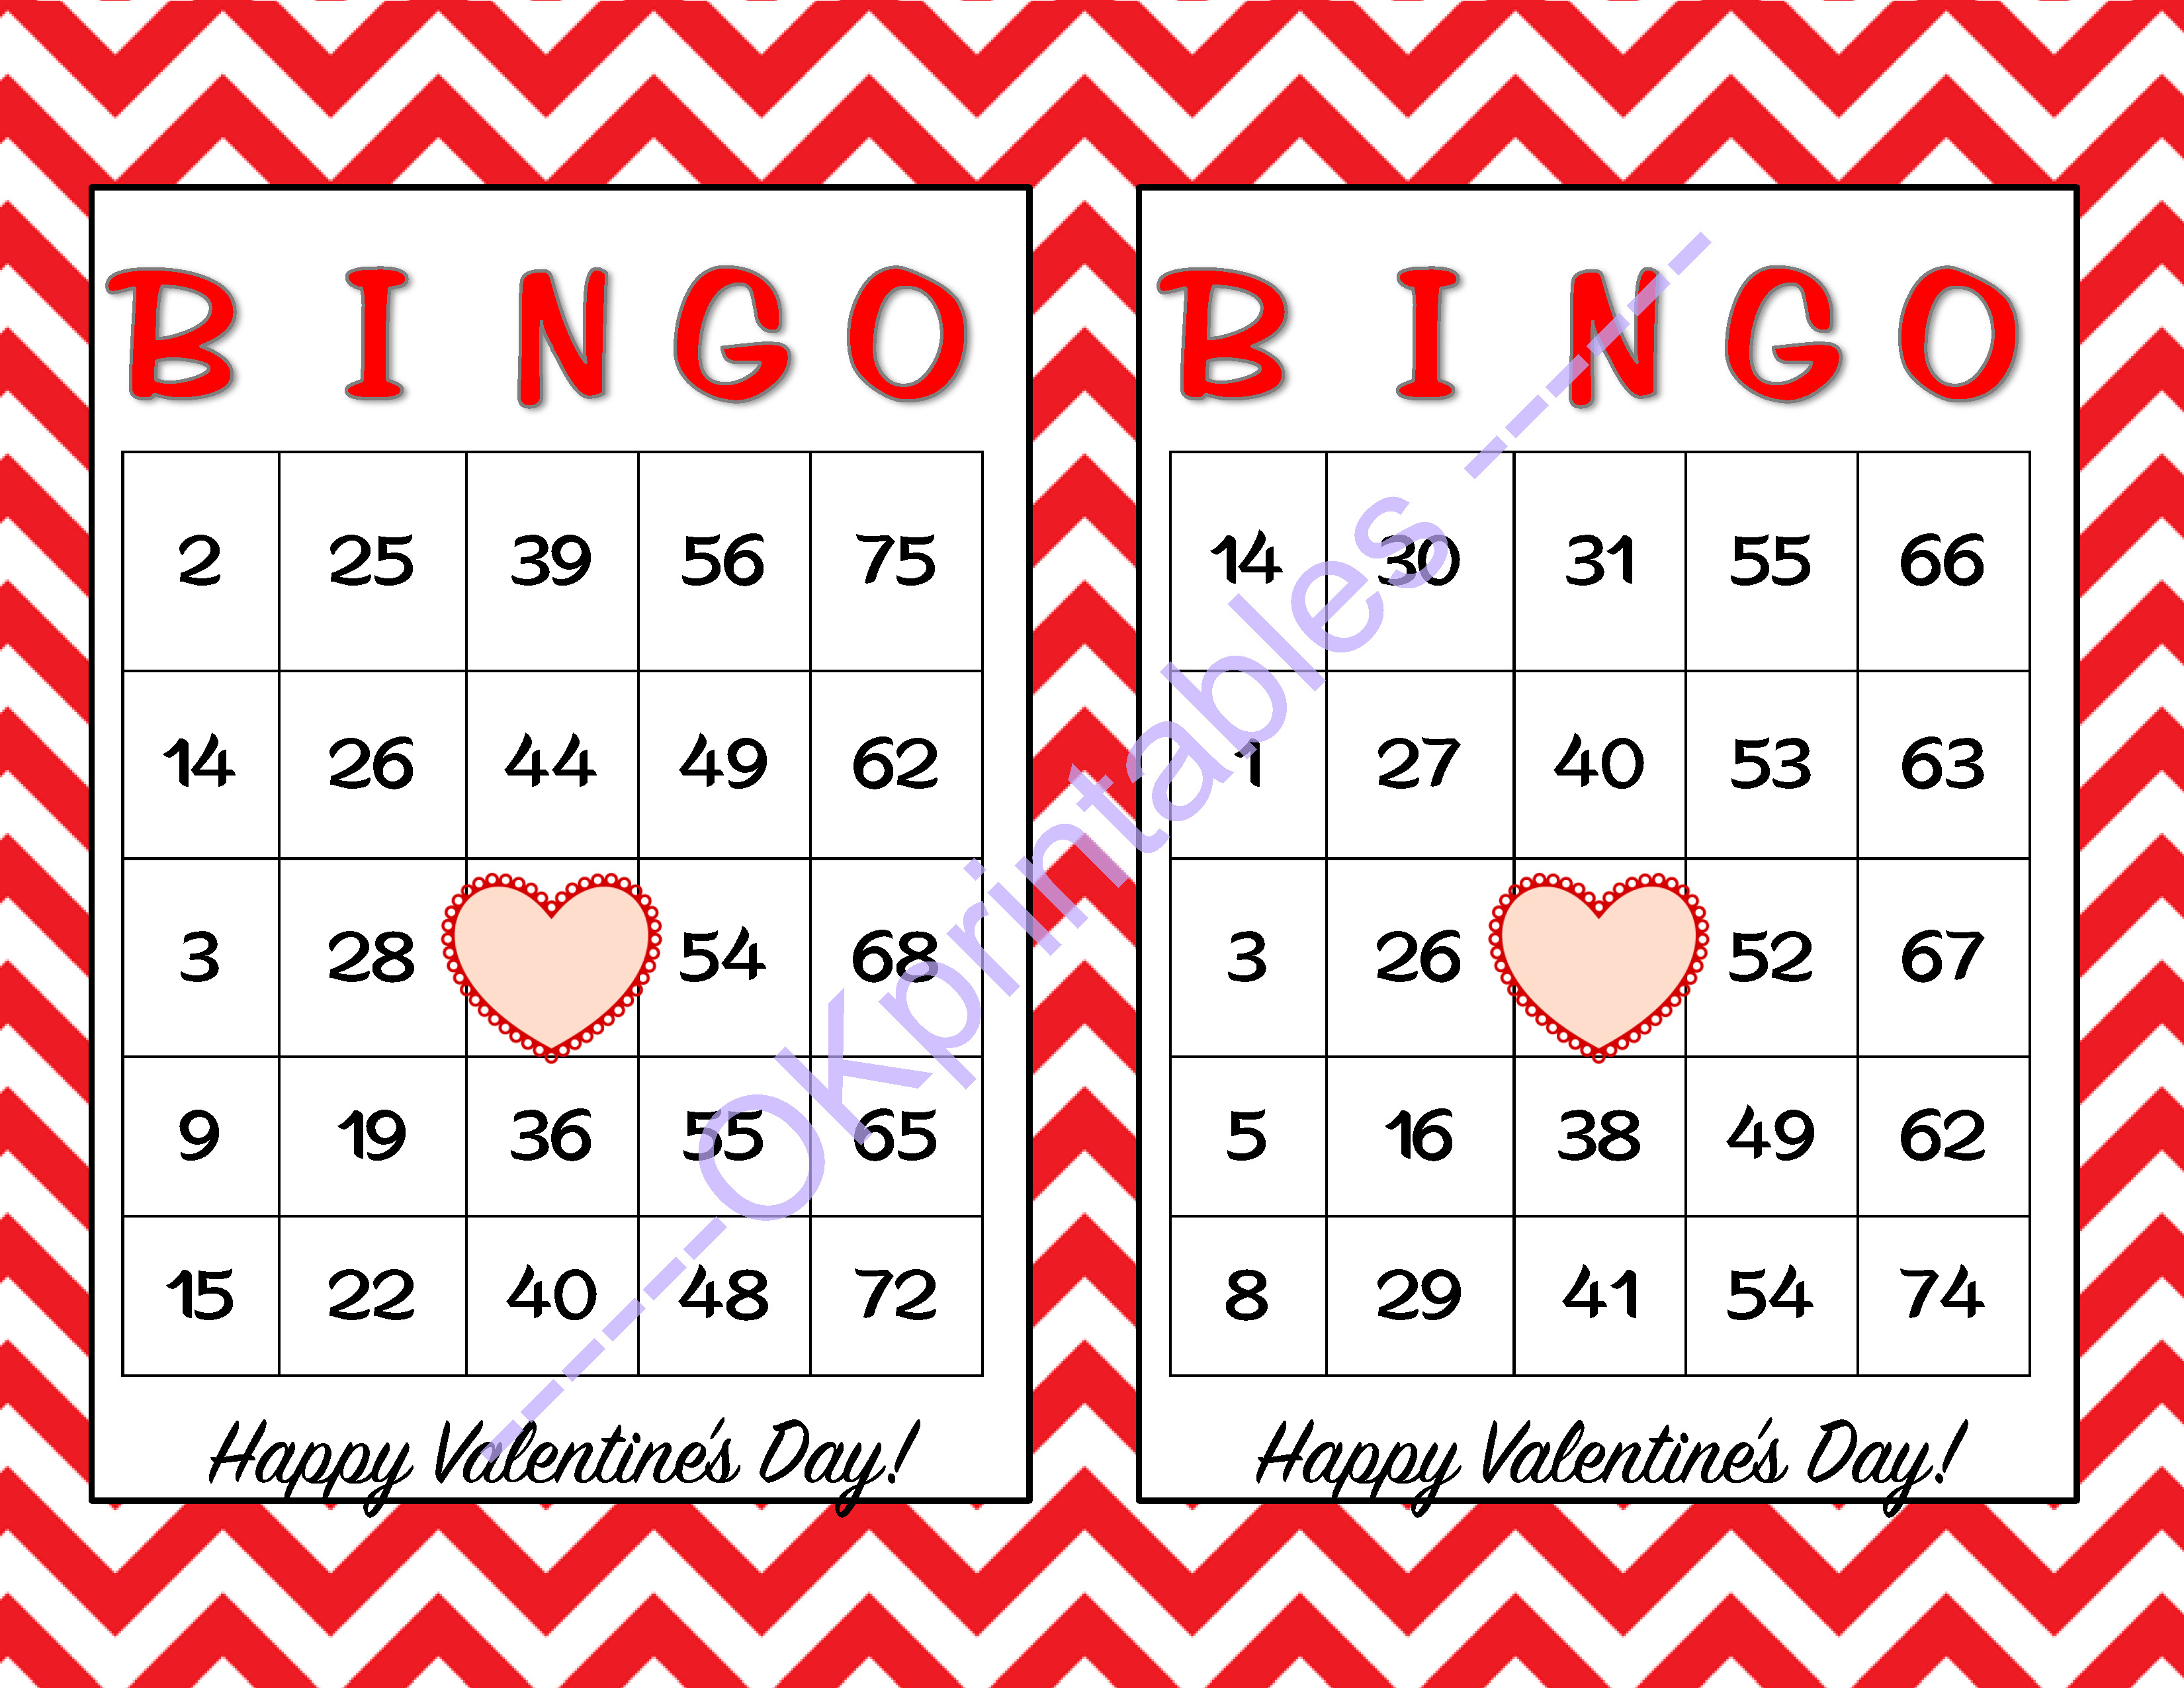 60 Happy Valentines Day Bingo Cards